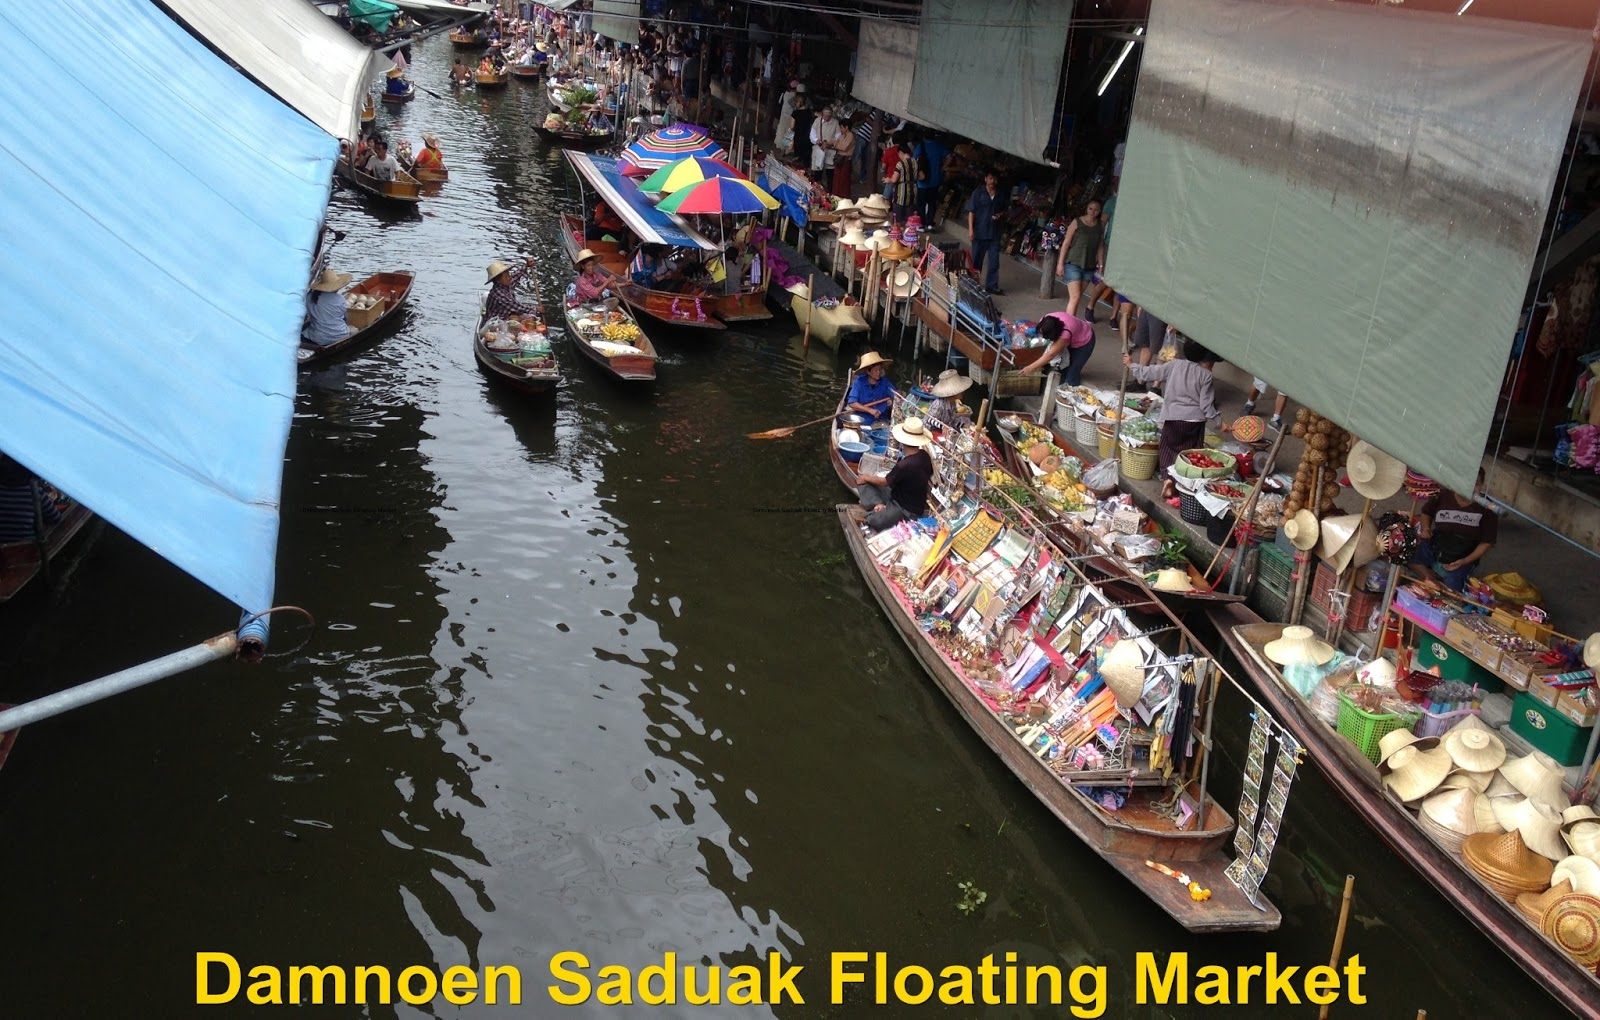 FoodieFC: Damnoen Saduak Floating Market (Thailand, Bangkok)